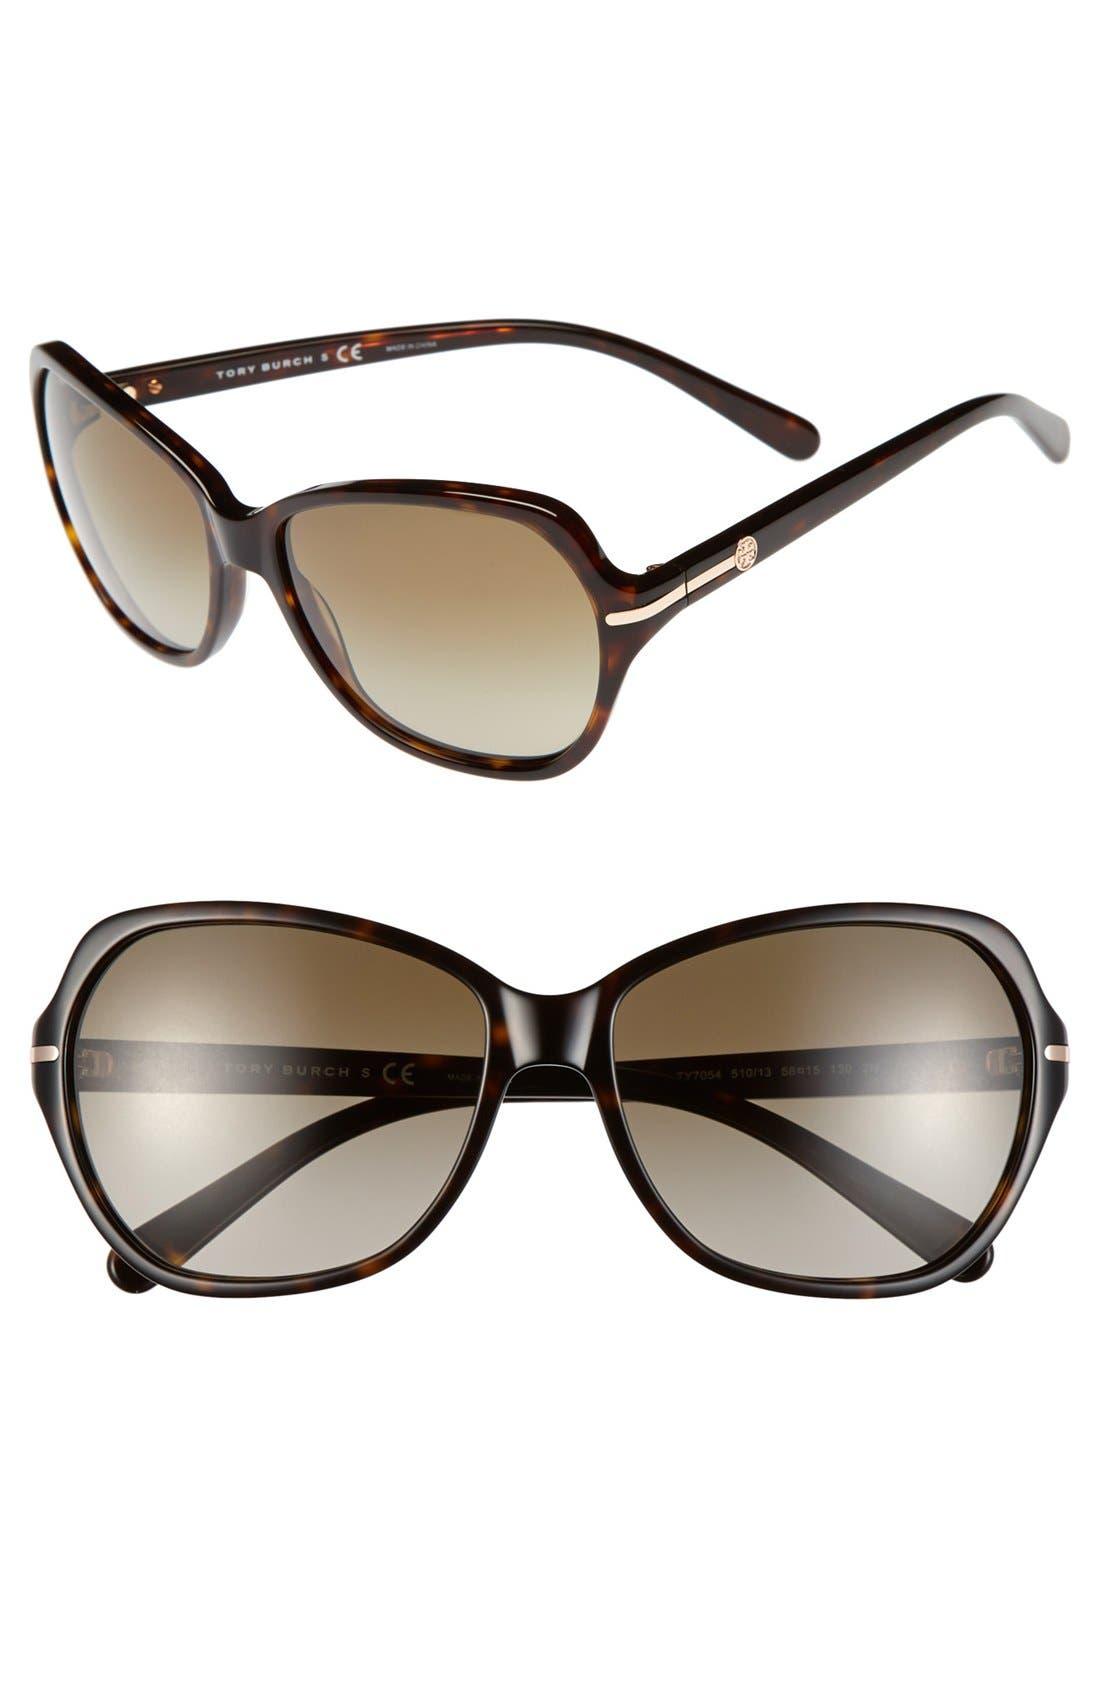 Main Image - Tory Burch 58mm Logo Bar Square Sunglasses